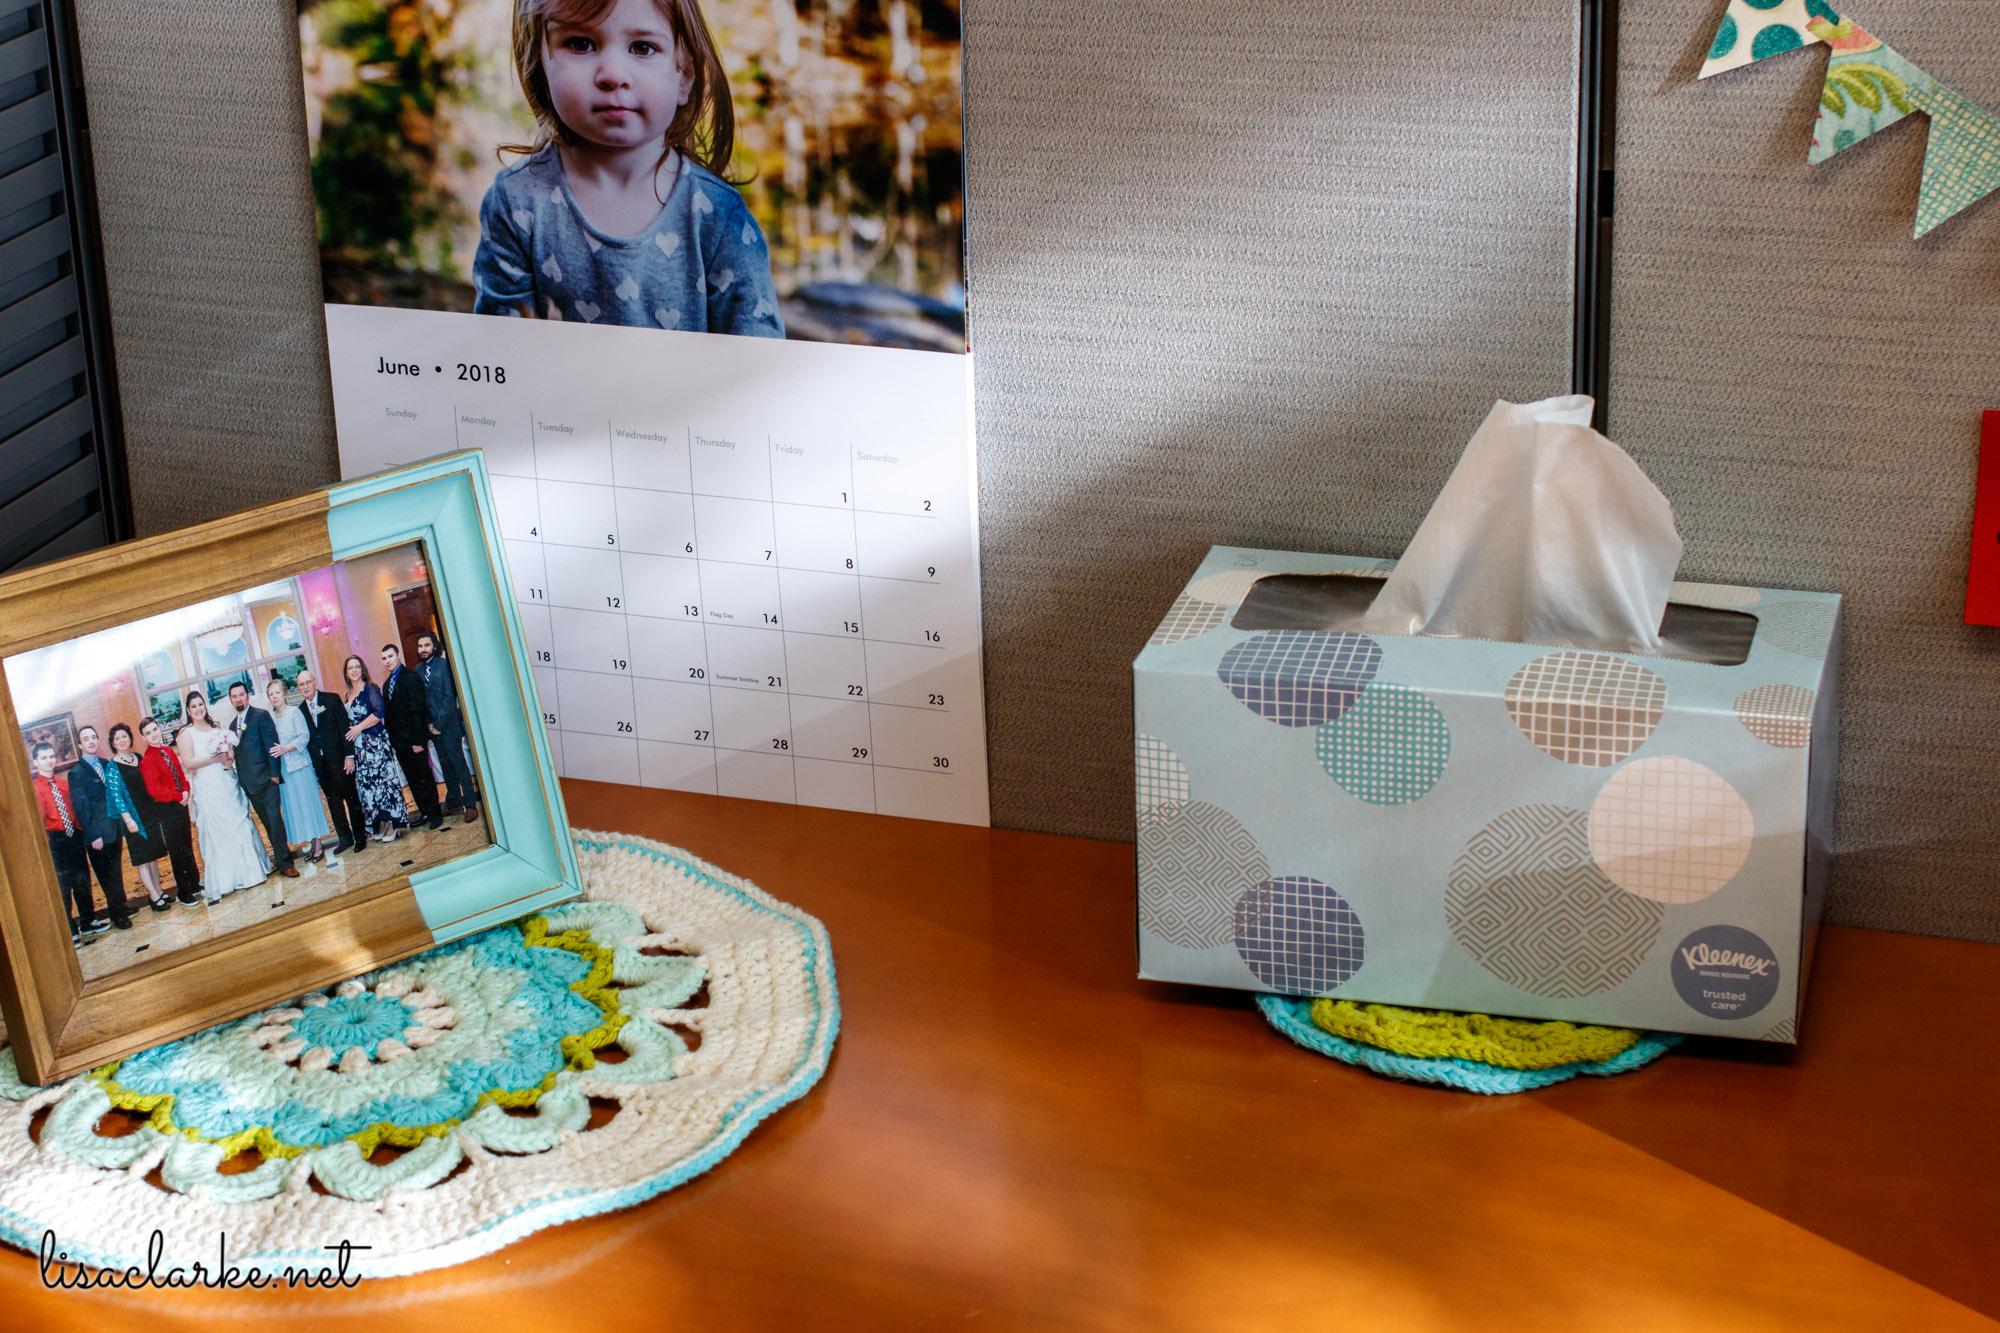 Ways to Make Your Cubicle Less Awful: Crochet Mandalas and Custom Calendar